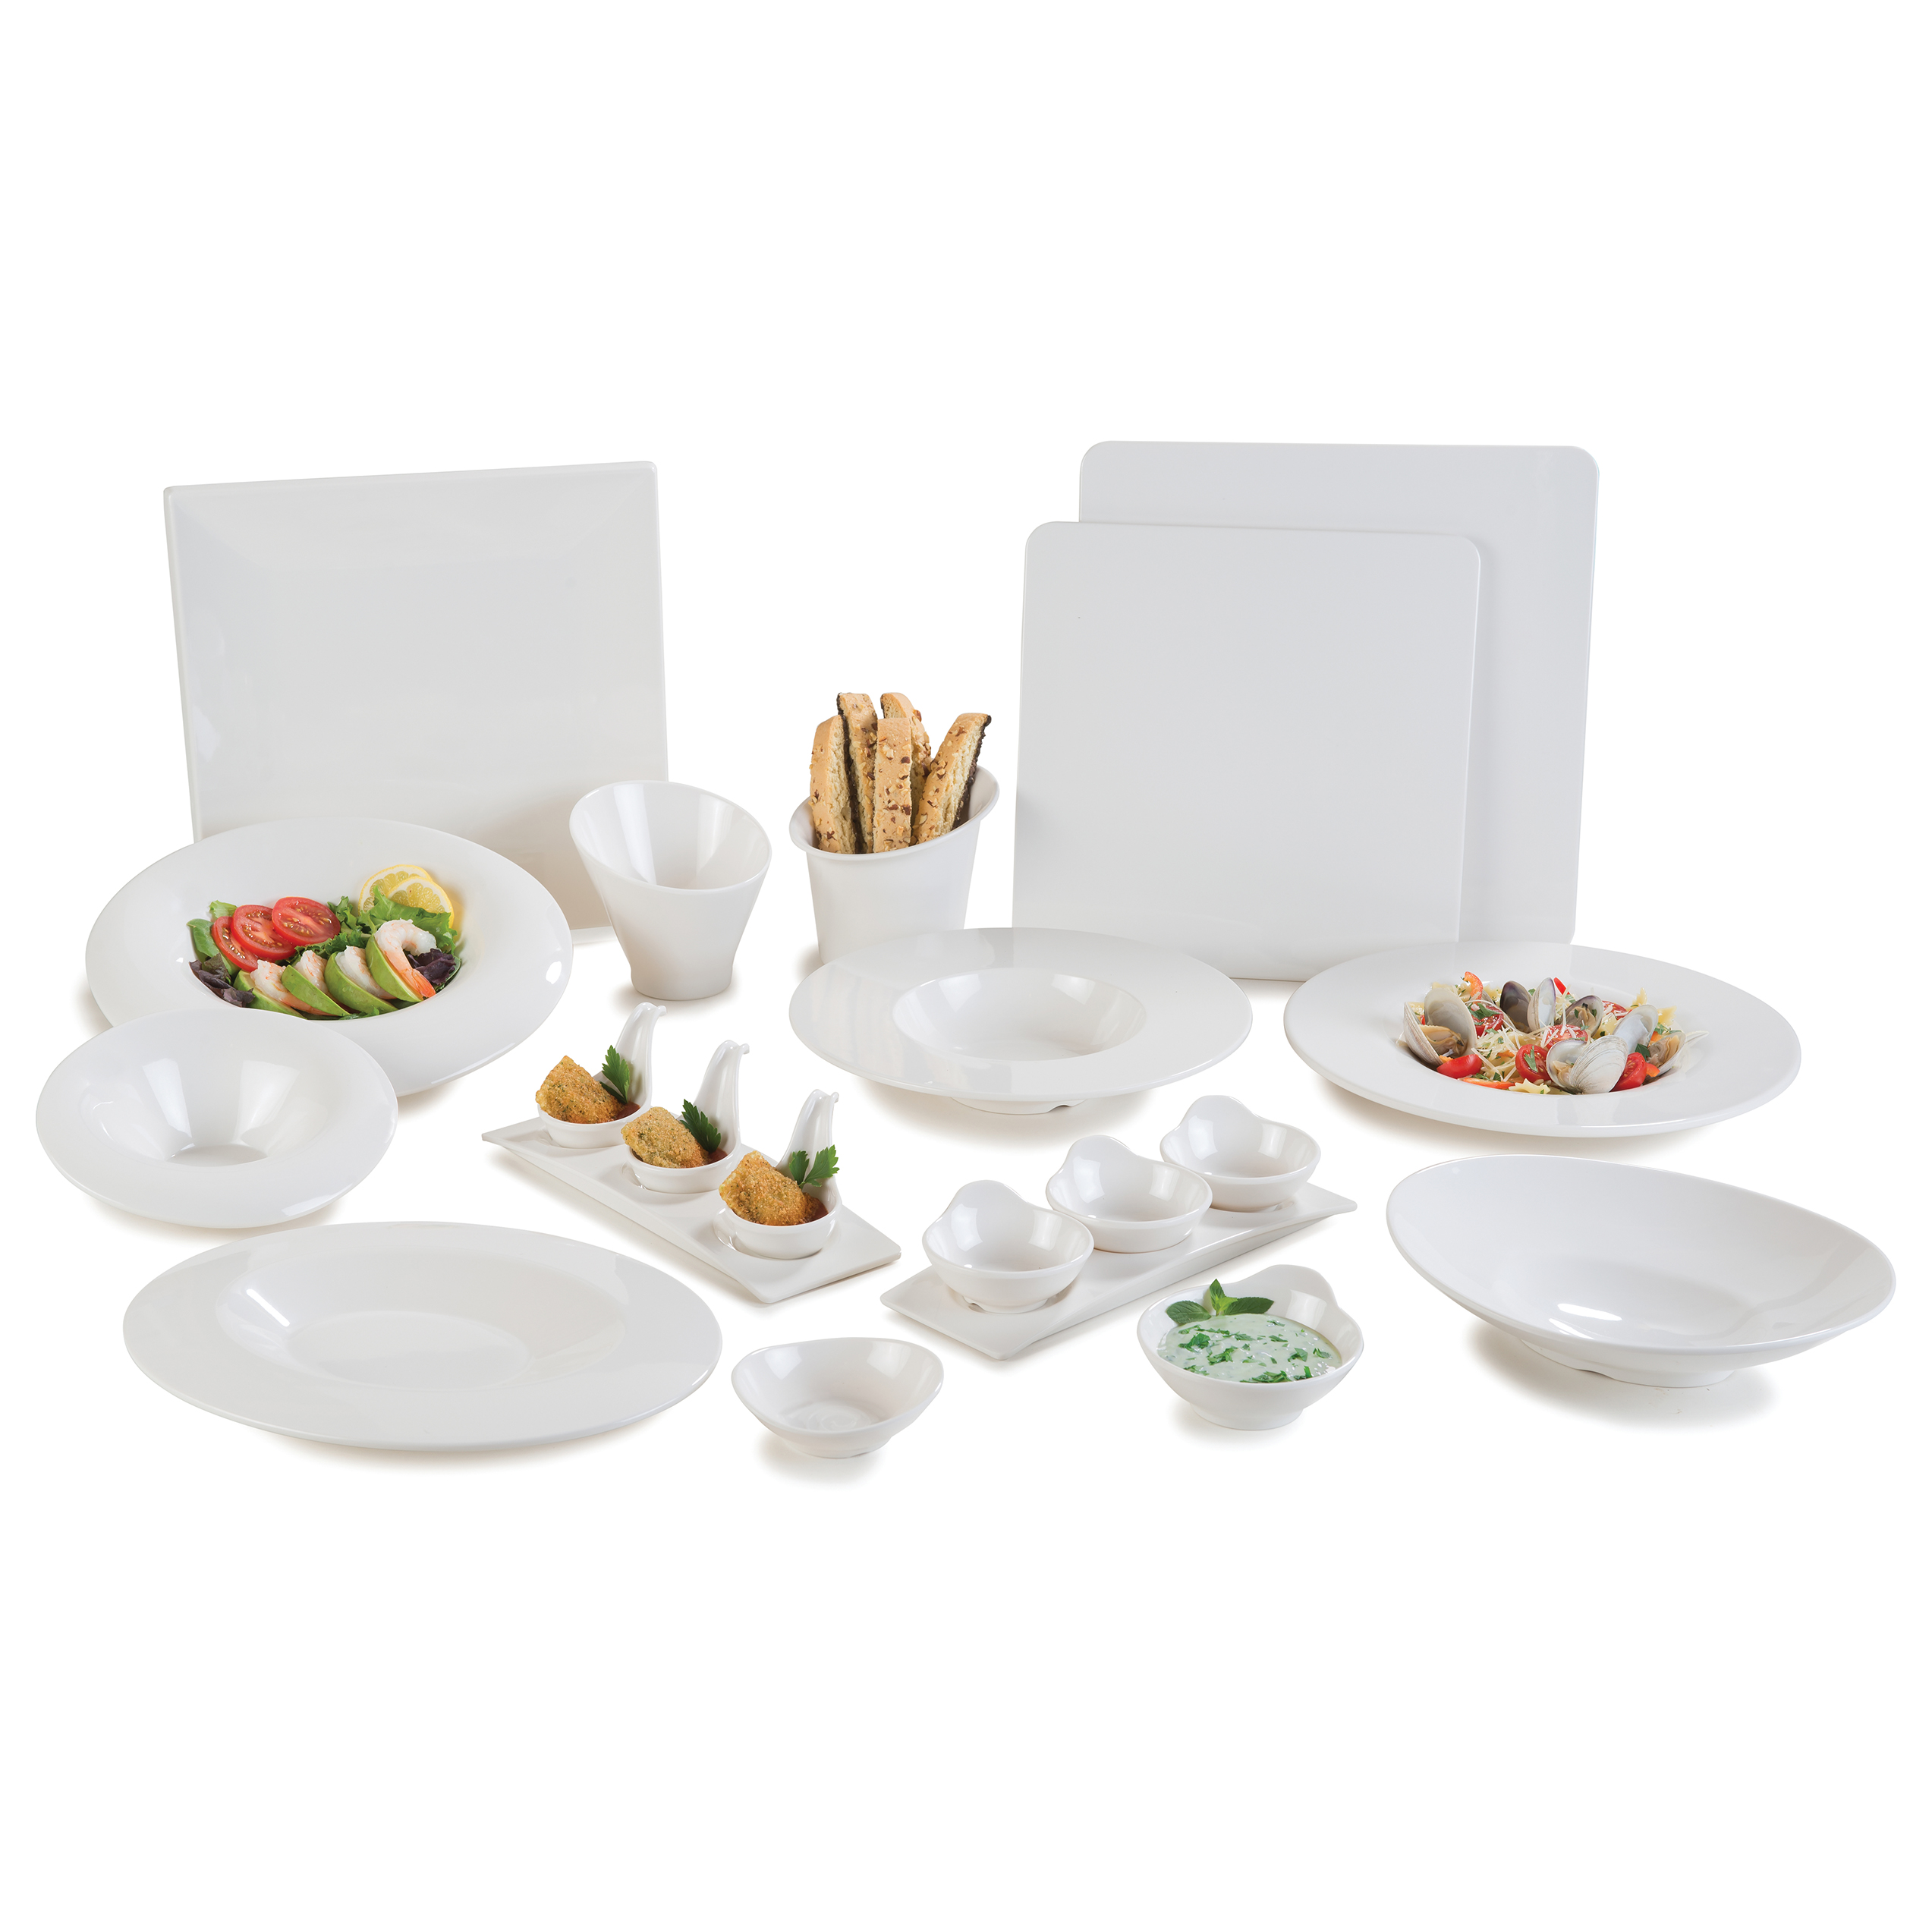 Carlisle HAL2602 serving & display tray